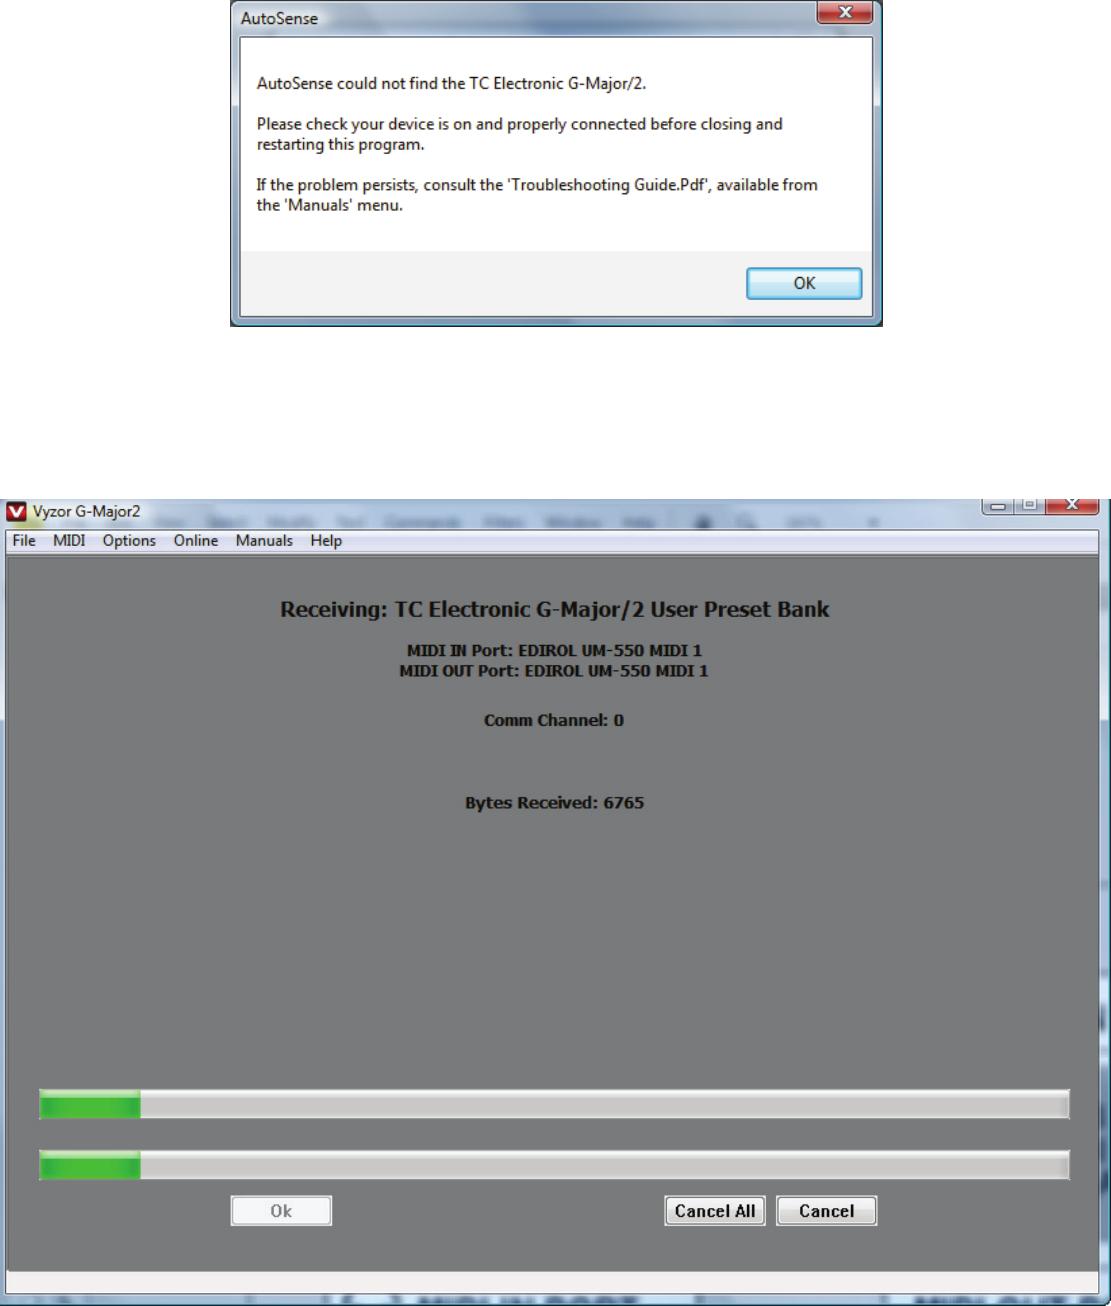 JBL Vyzor G Major2 Quick Start Major 2 Guide English